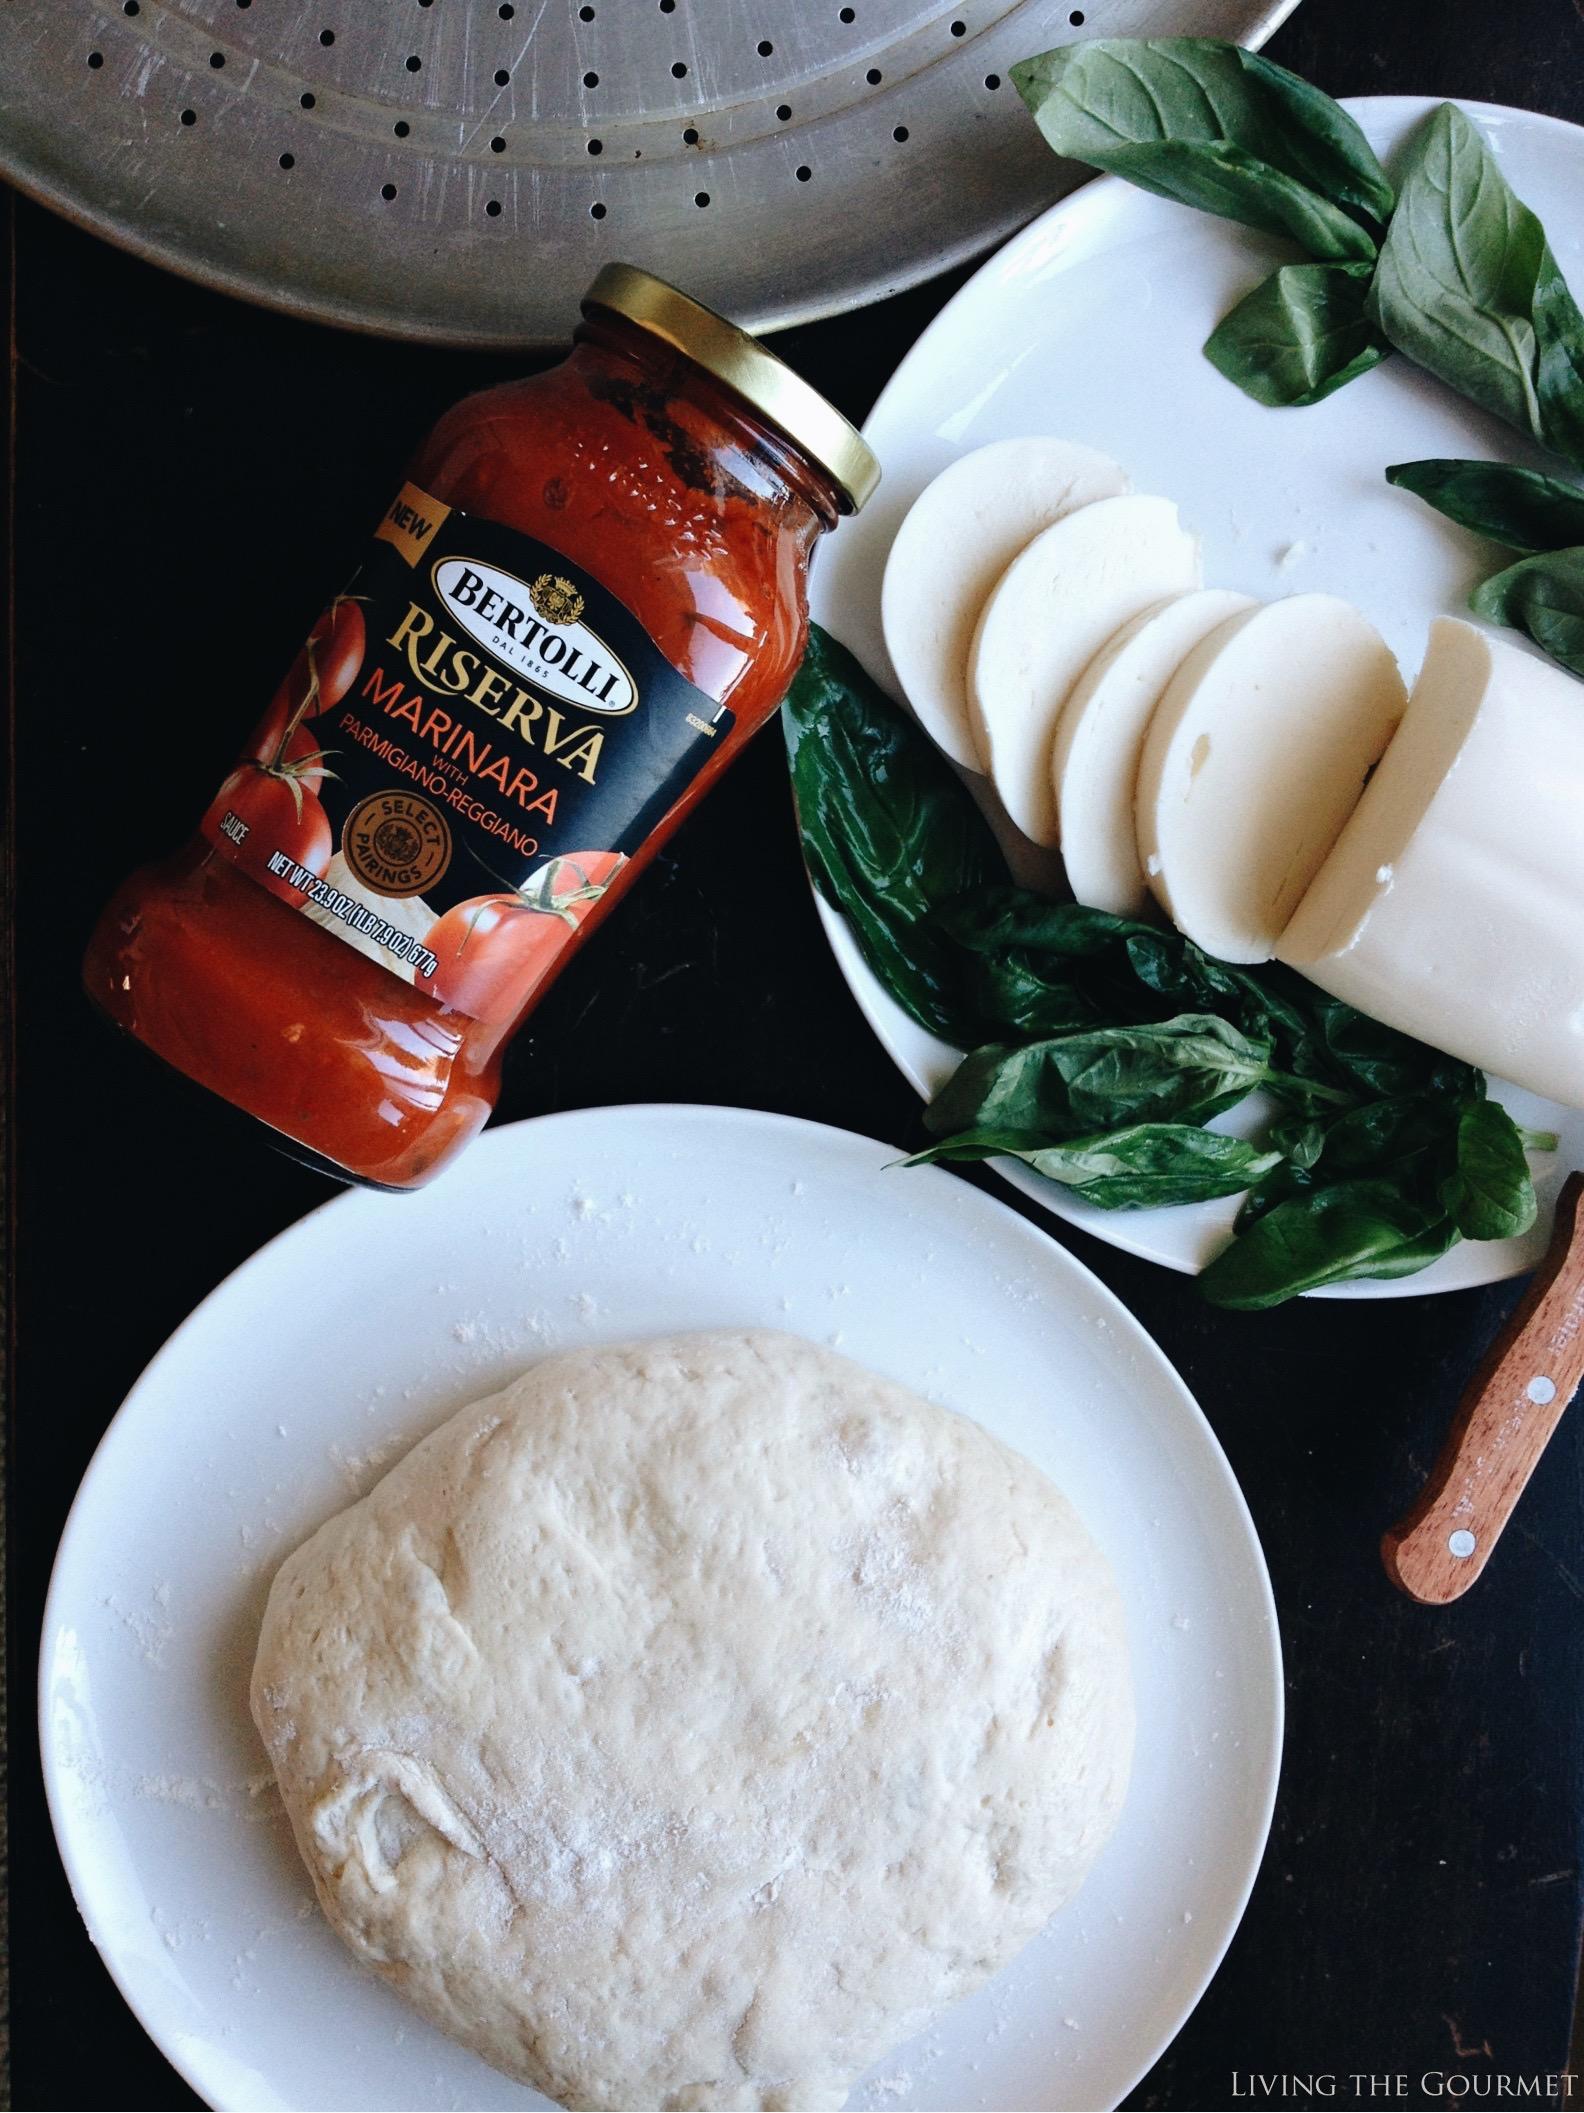 Living the Gourmet: Margherita Pizza